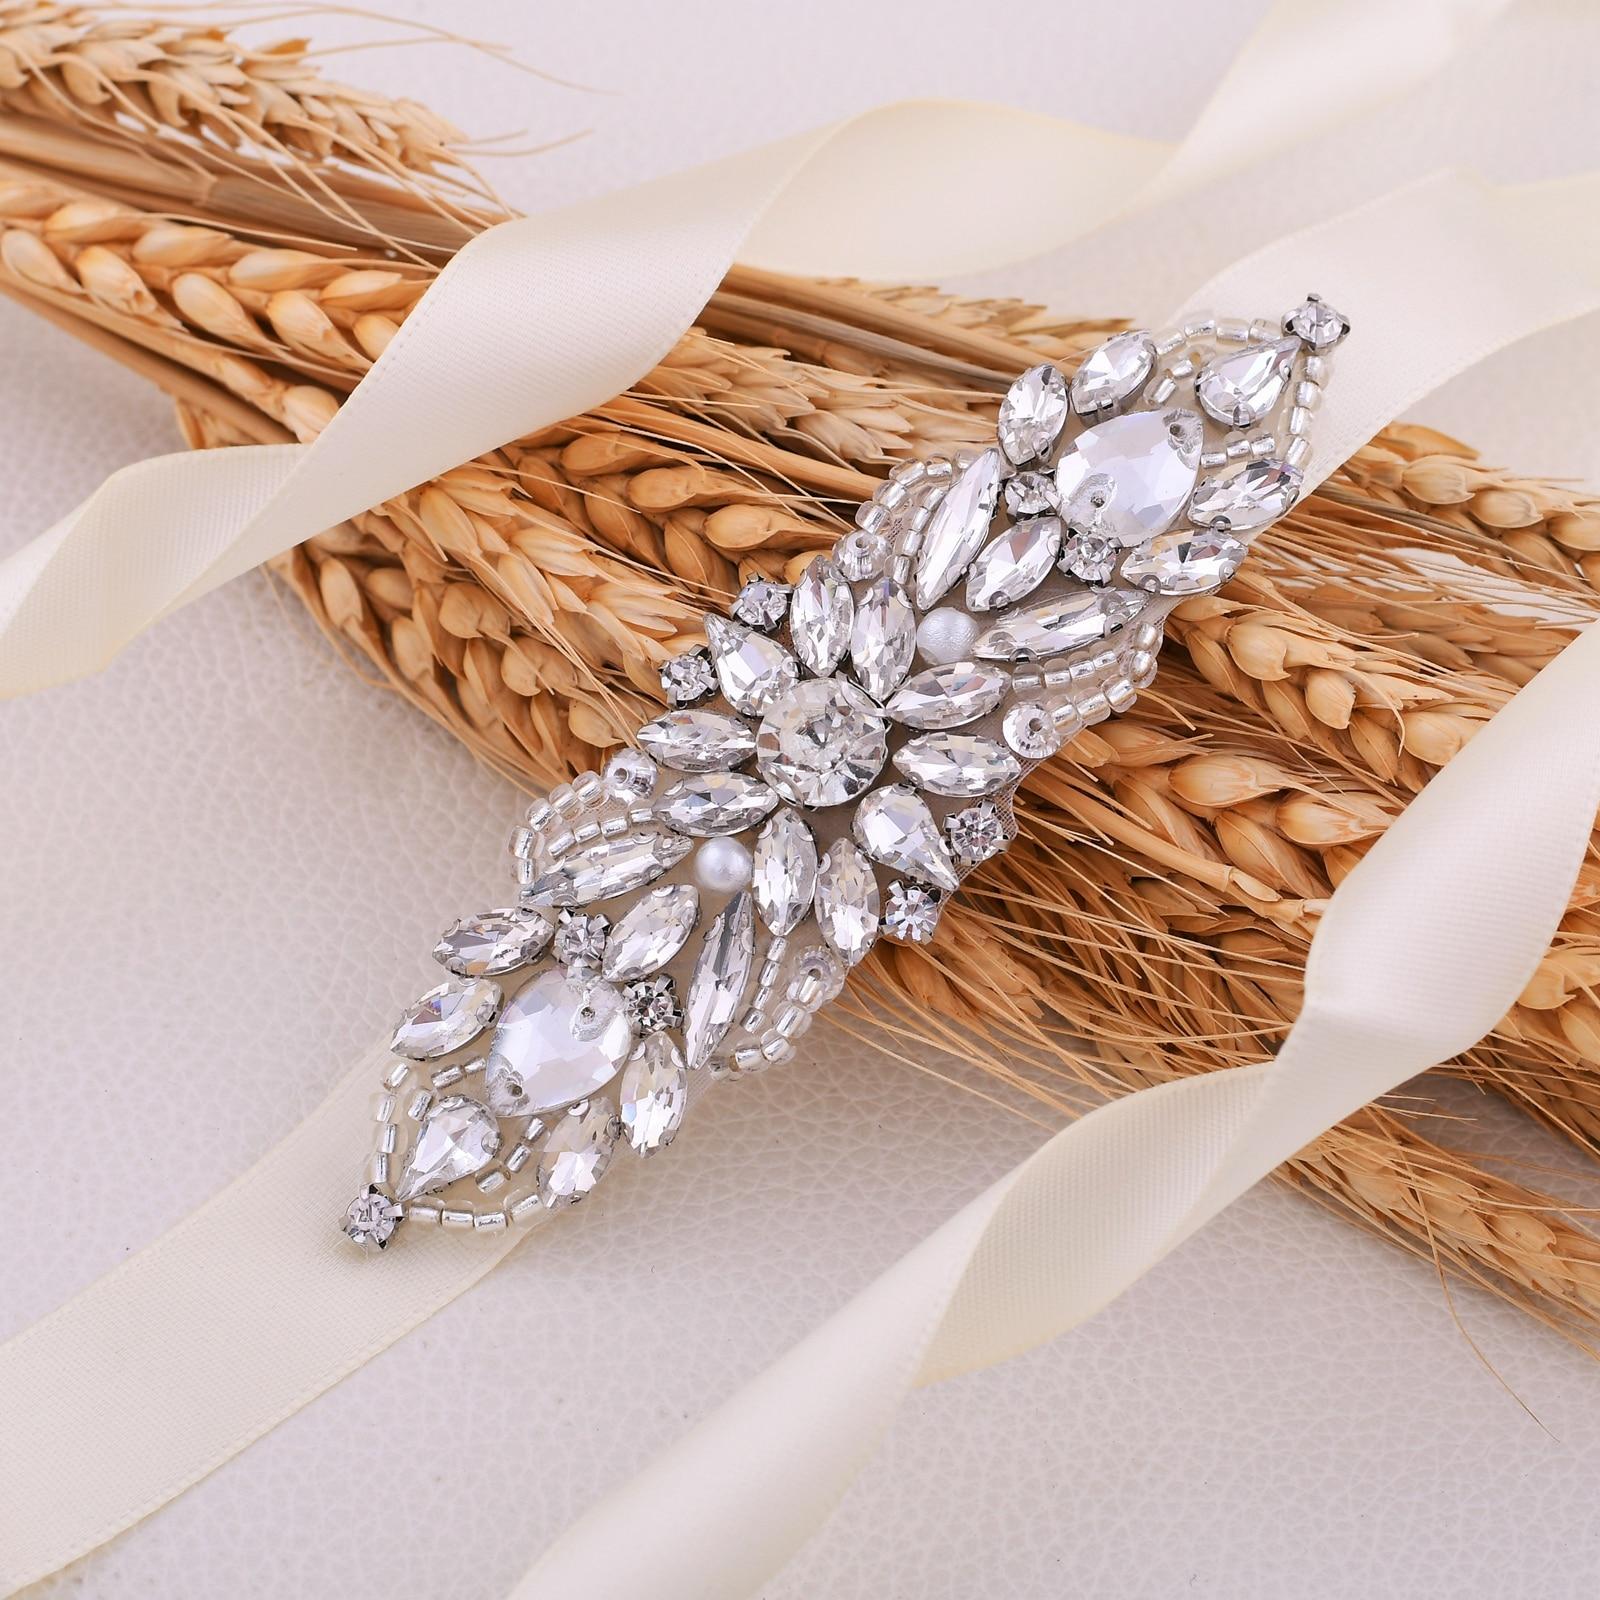 S337 Fashion Women Wedding Belt Bridal Dress Accessories Rhinestone Bridesmaid Dress Belts Prom Evening Dresses Belt for Women